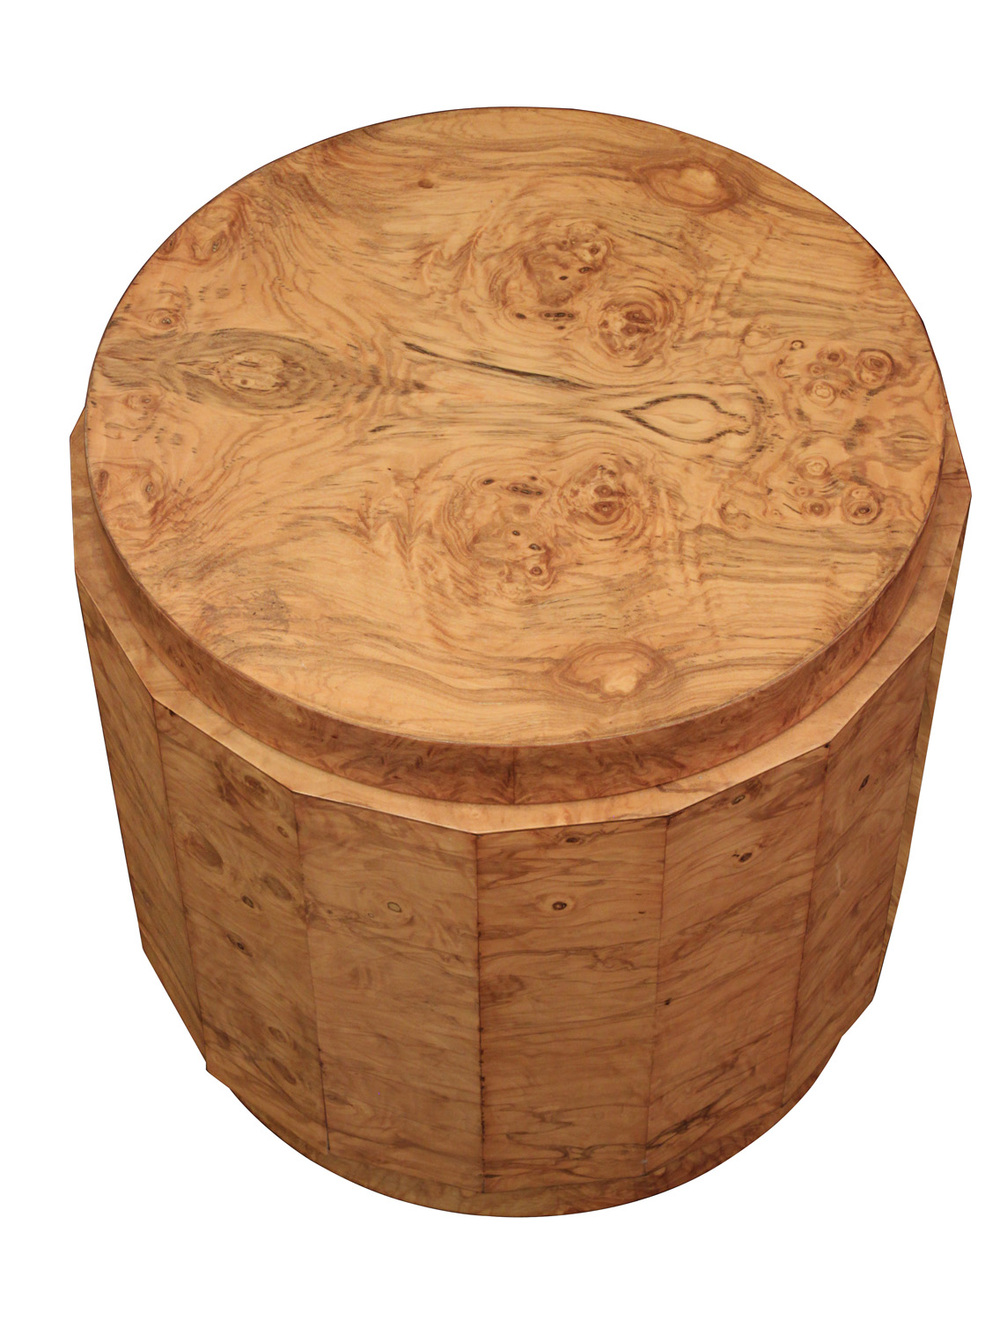 Dunbar 85 olive burl pedestal+gls coffeetable375 detail2 hires.jpg